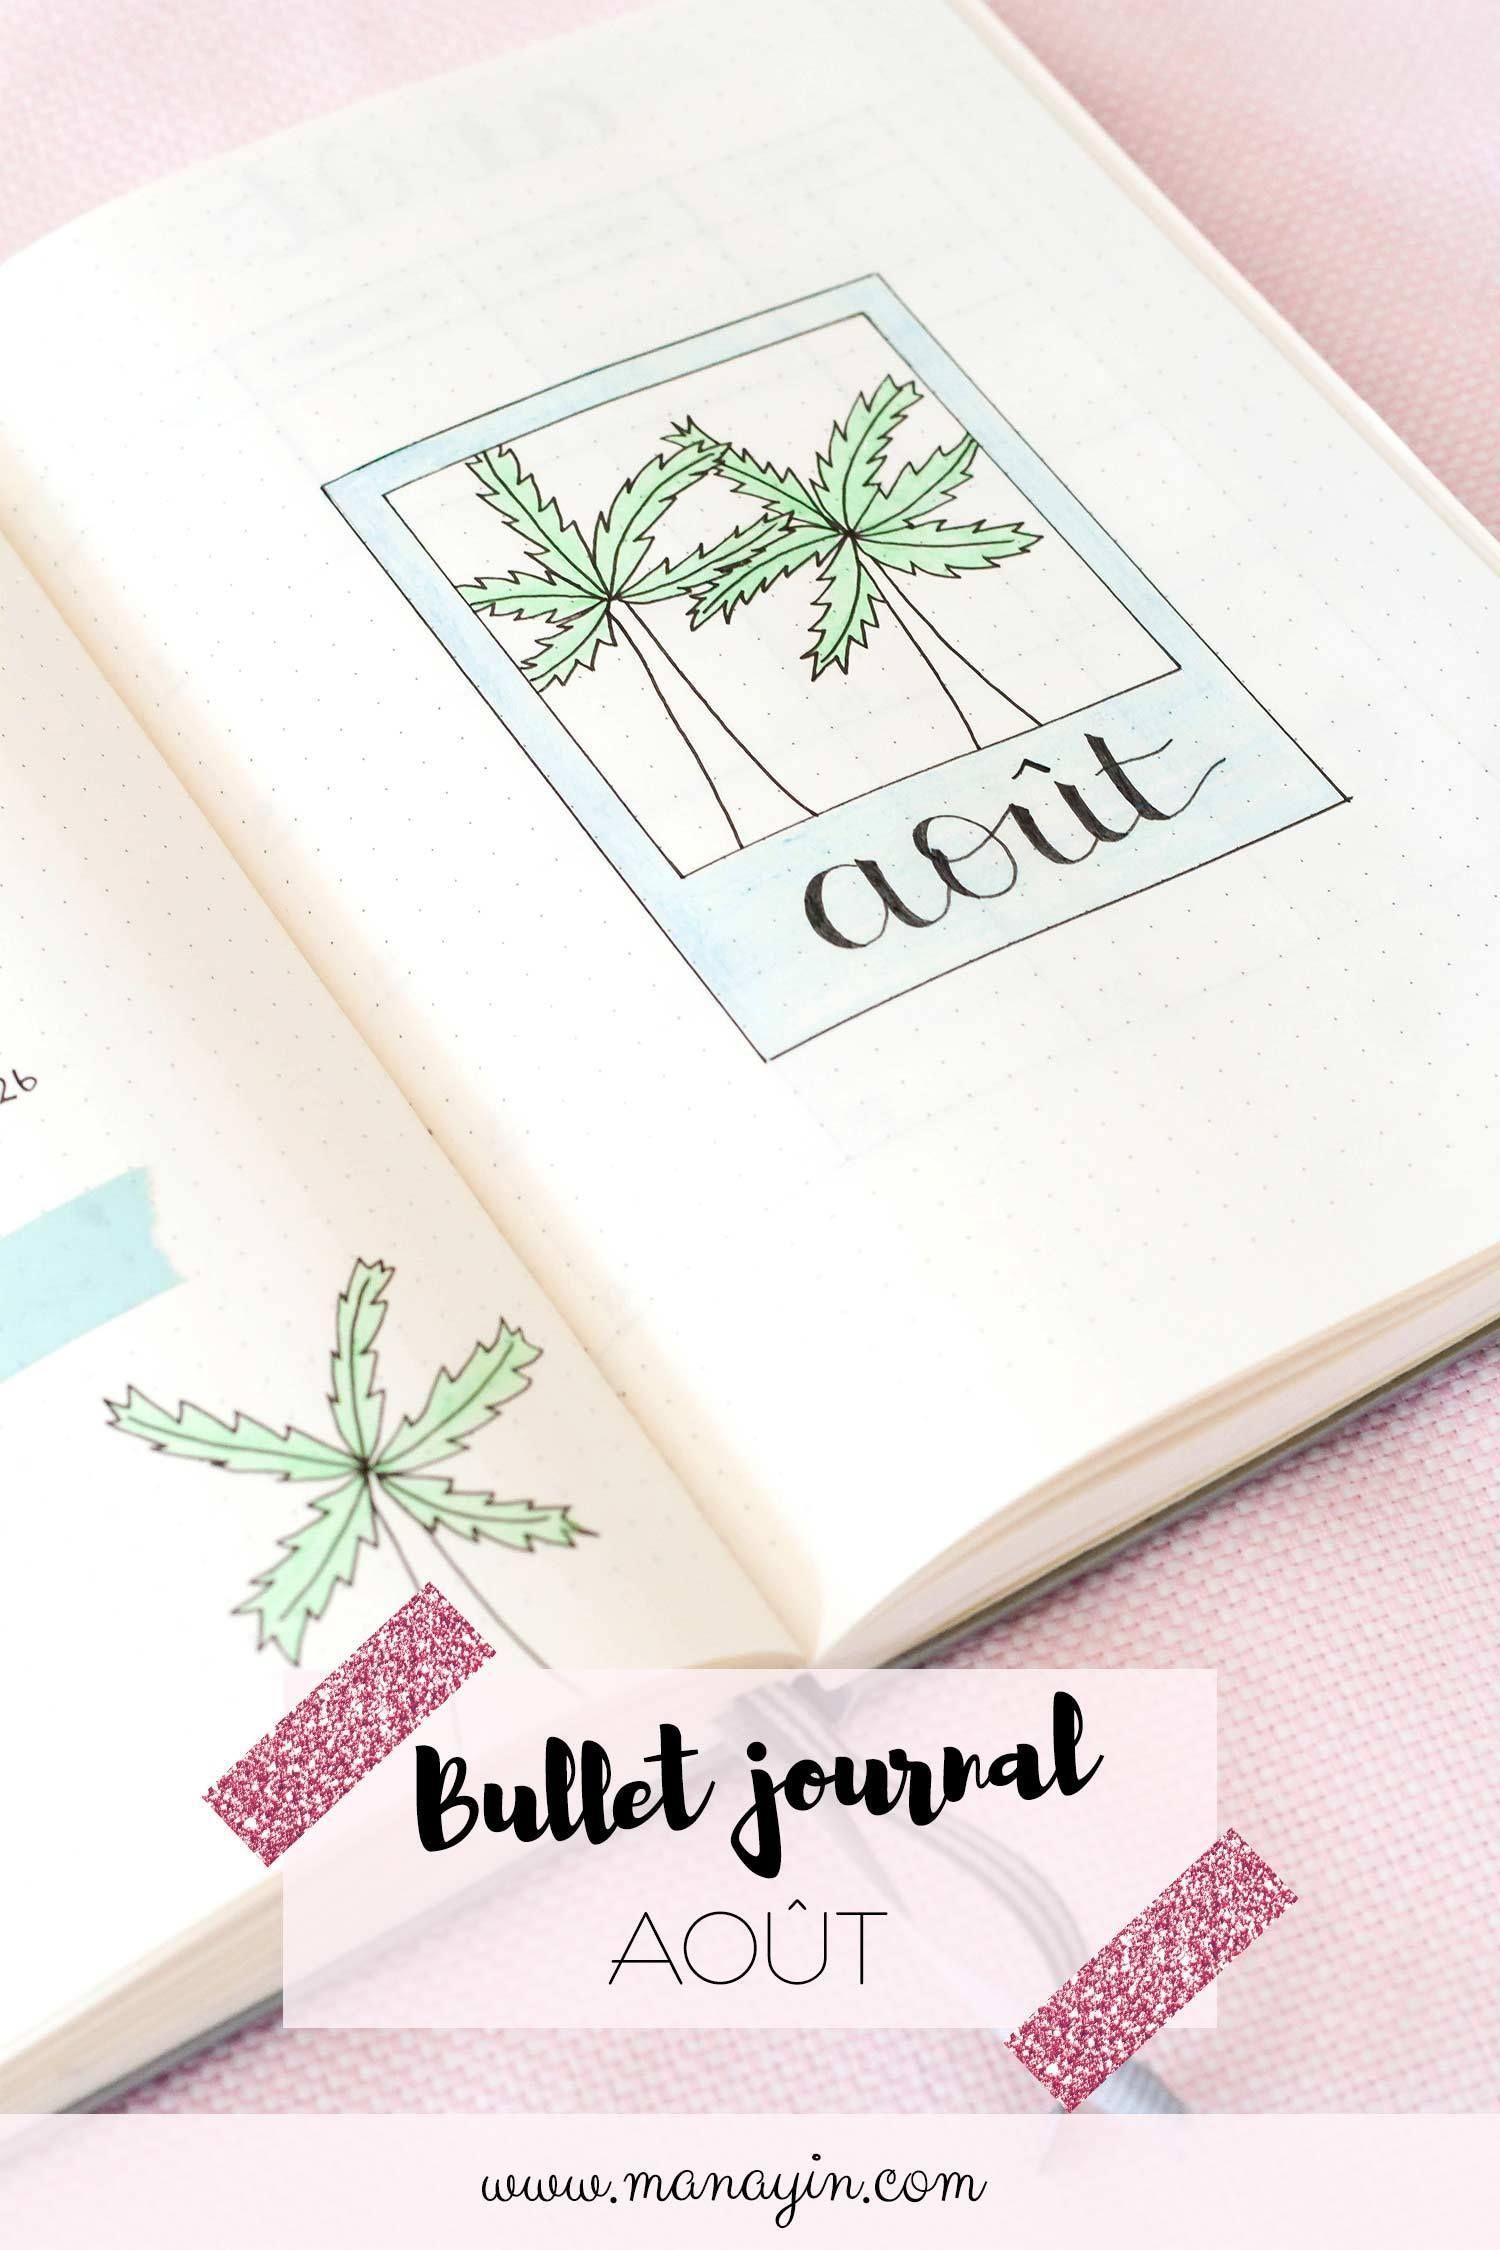 Bullet Journal Août : Une mise en page estivale ! - Manayin